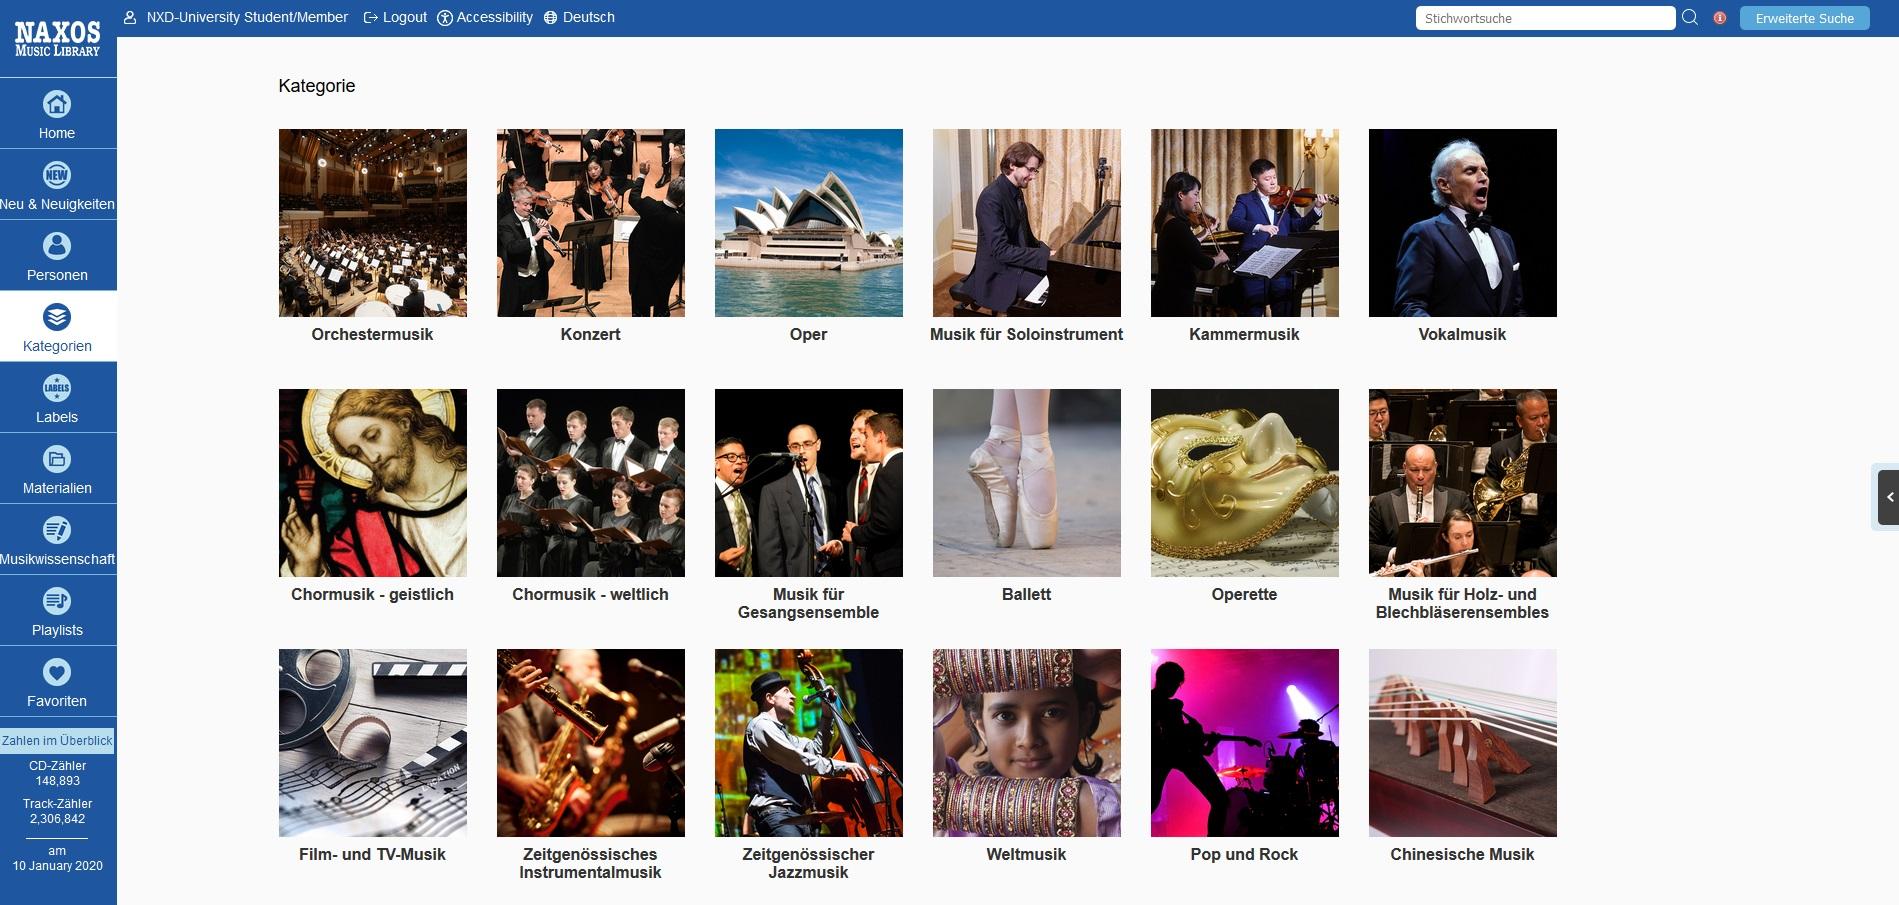 Naxos Music Library - Kategorien